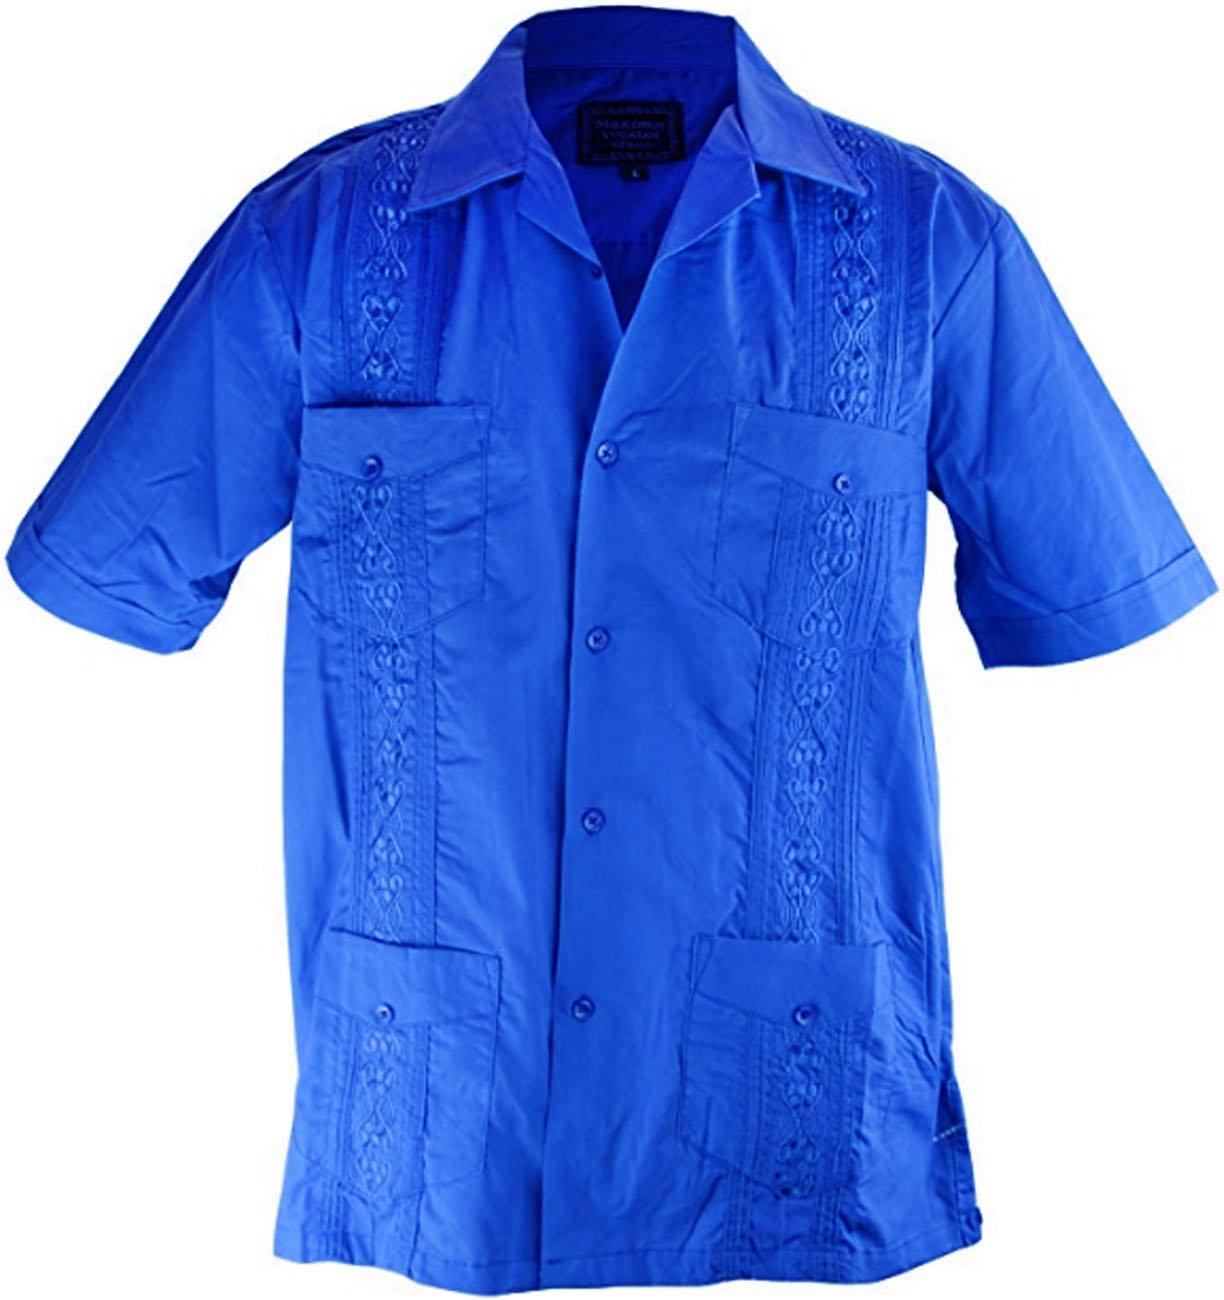 Cathedral Men's Short Sleeve Cuban Guayabera Shirt (3X-Large, Royal Blue)